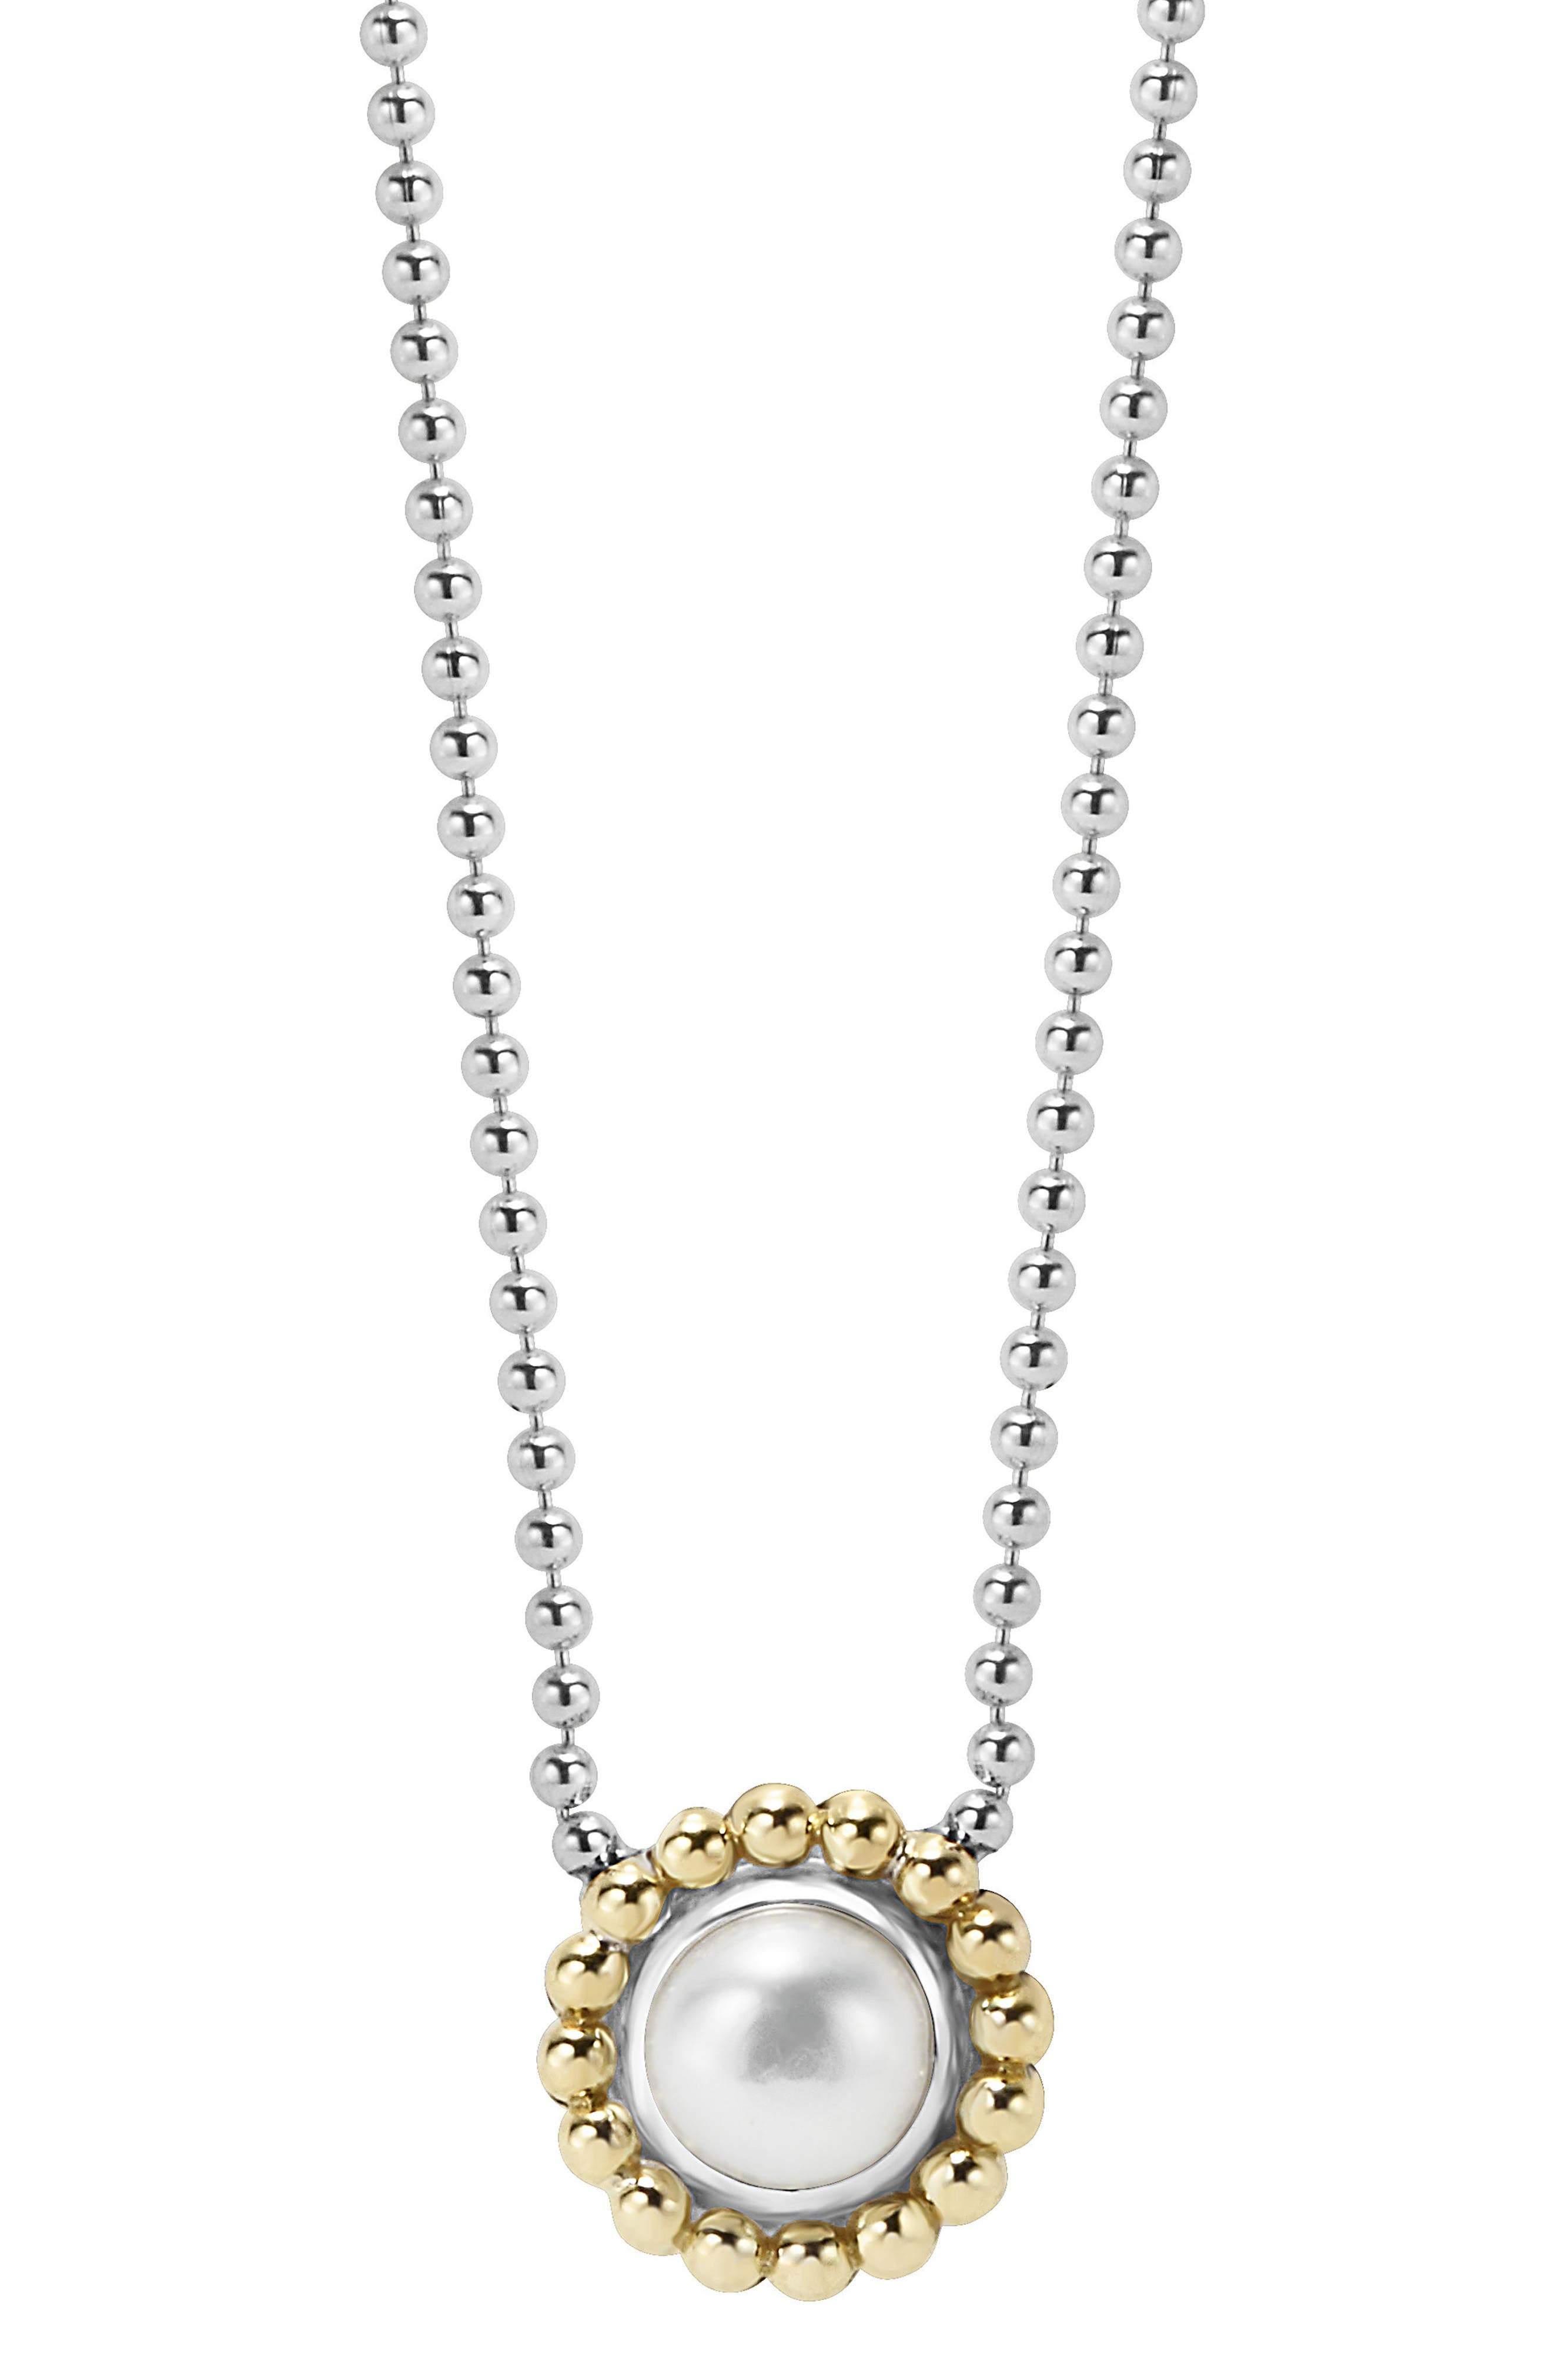 Stone Pendant Necklace,                             Main thumbnail 1, color,                             PEARL